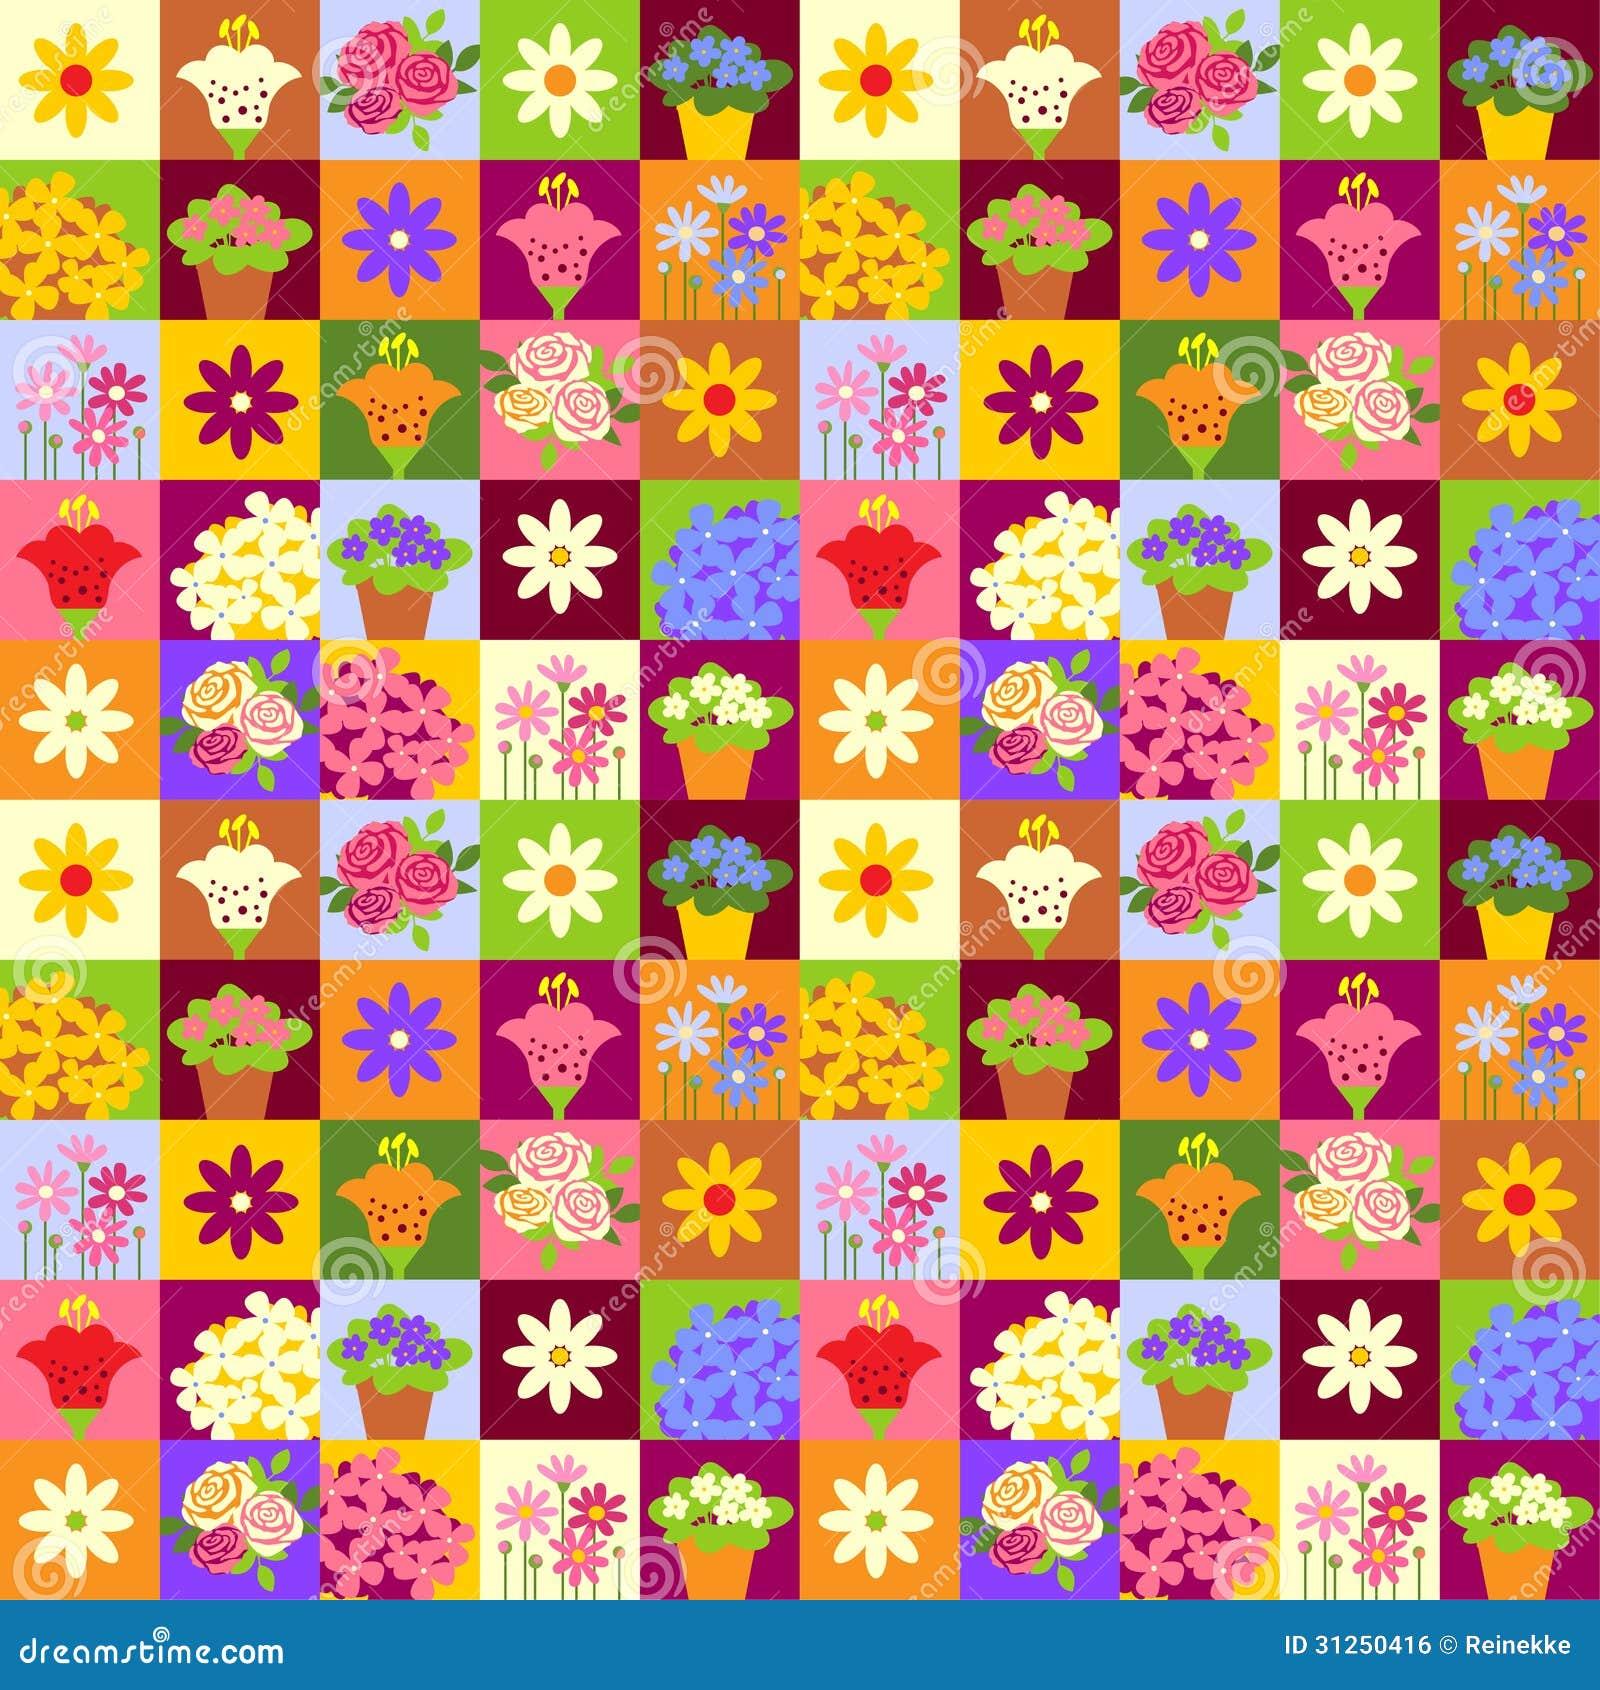 Mosaic flower pattern